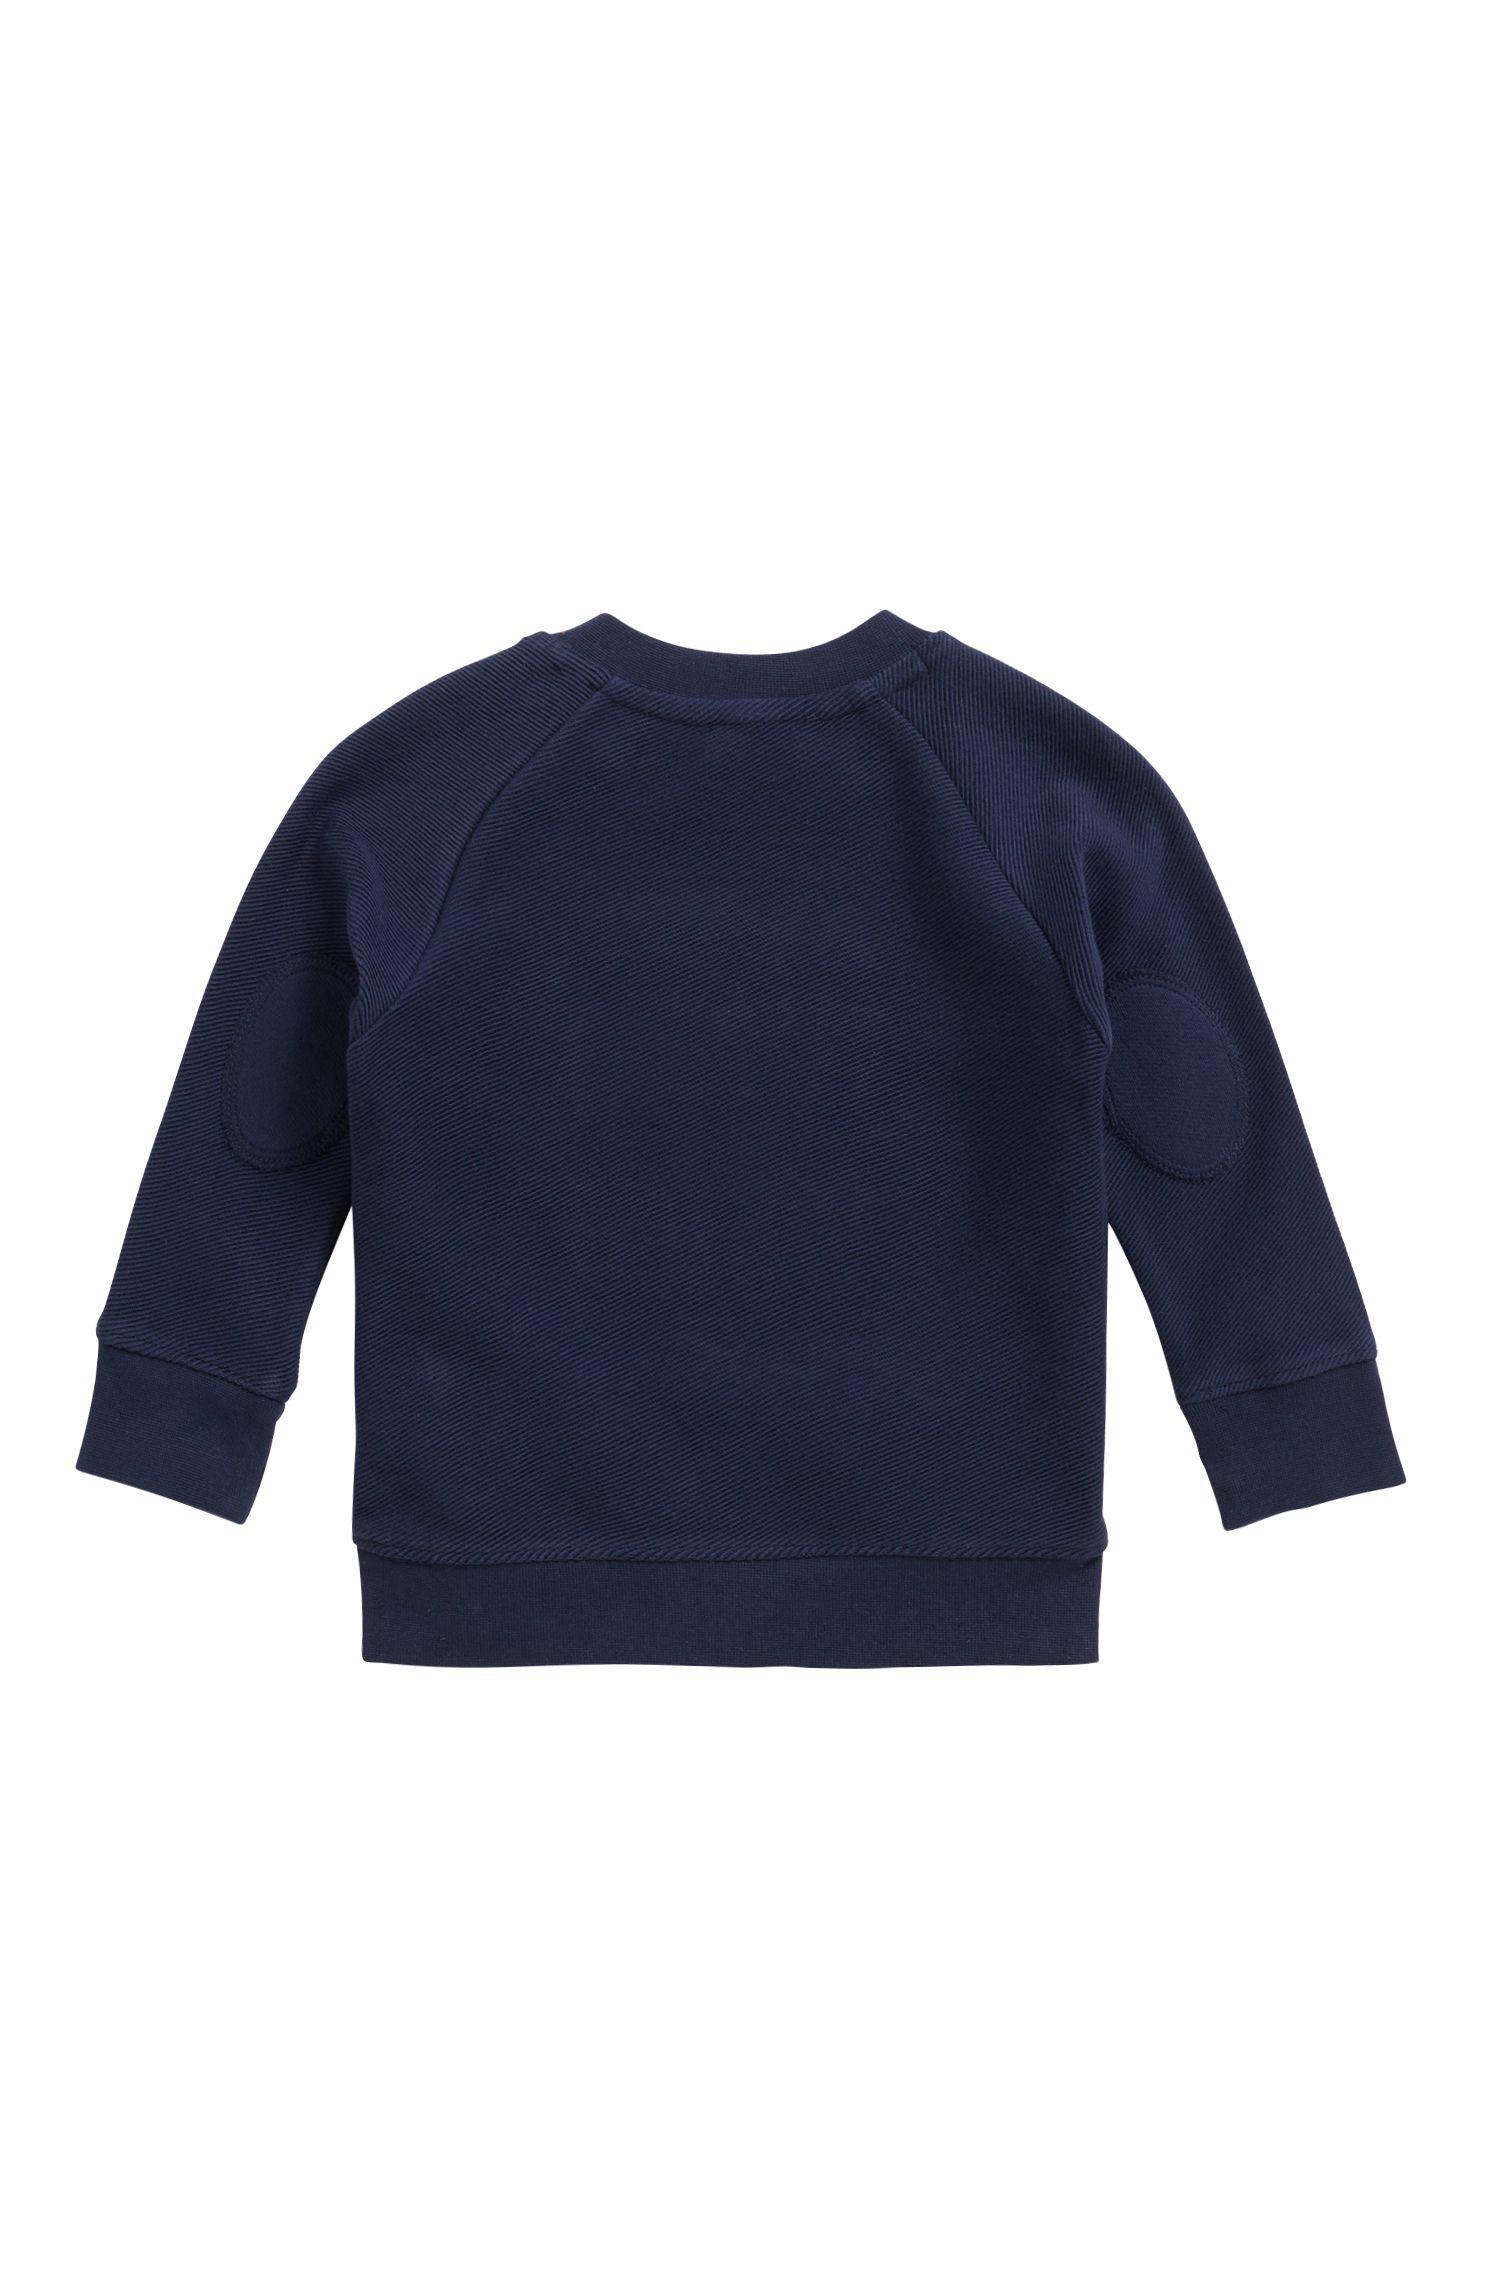 Baby-Sweatshirt aus Fleece, Dunkelblau